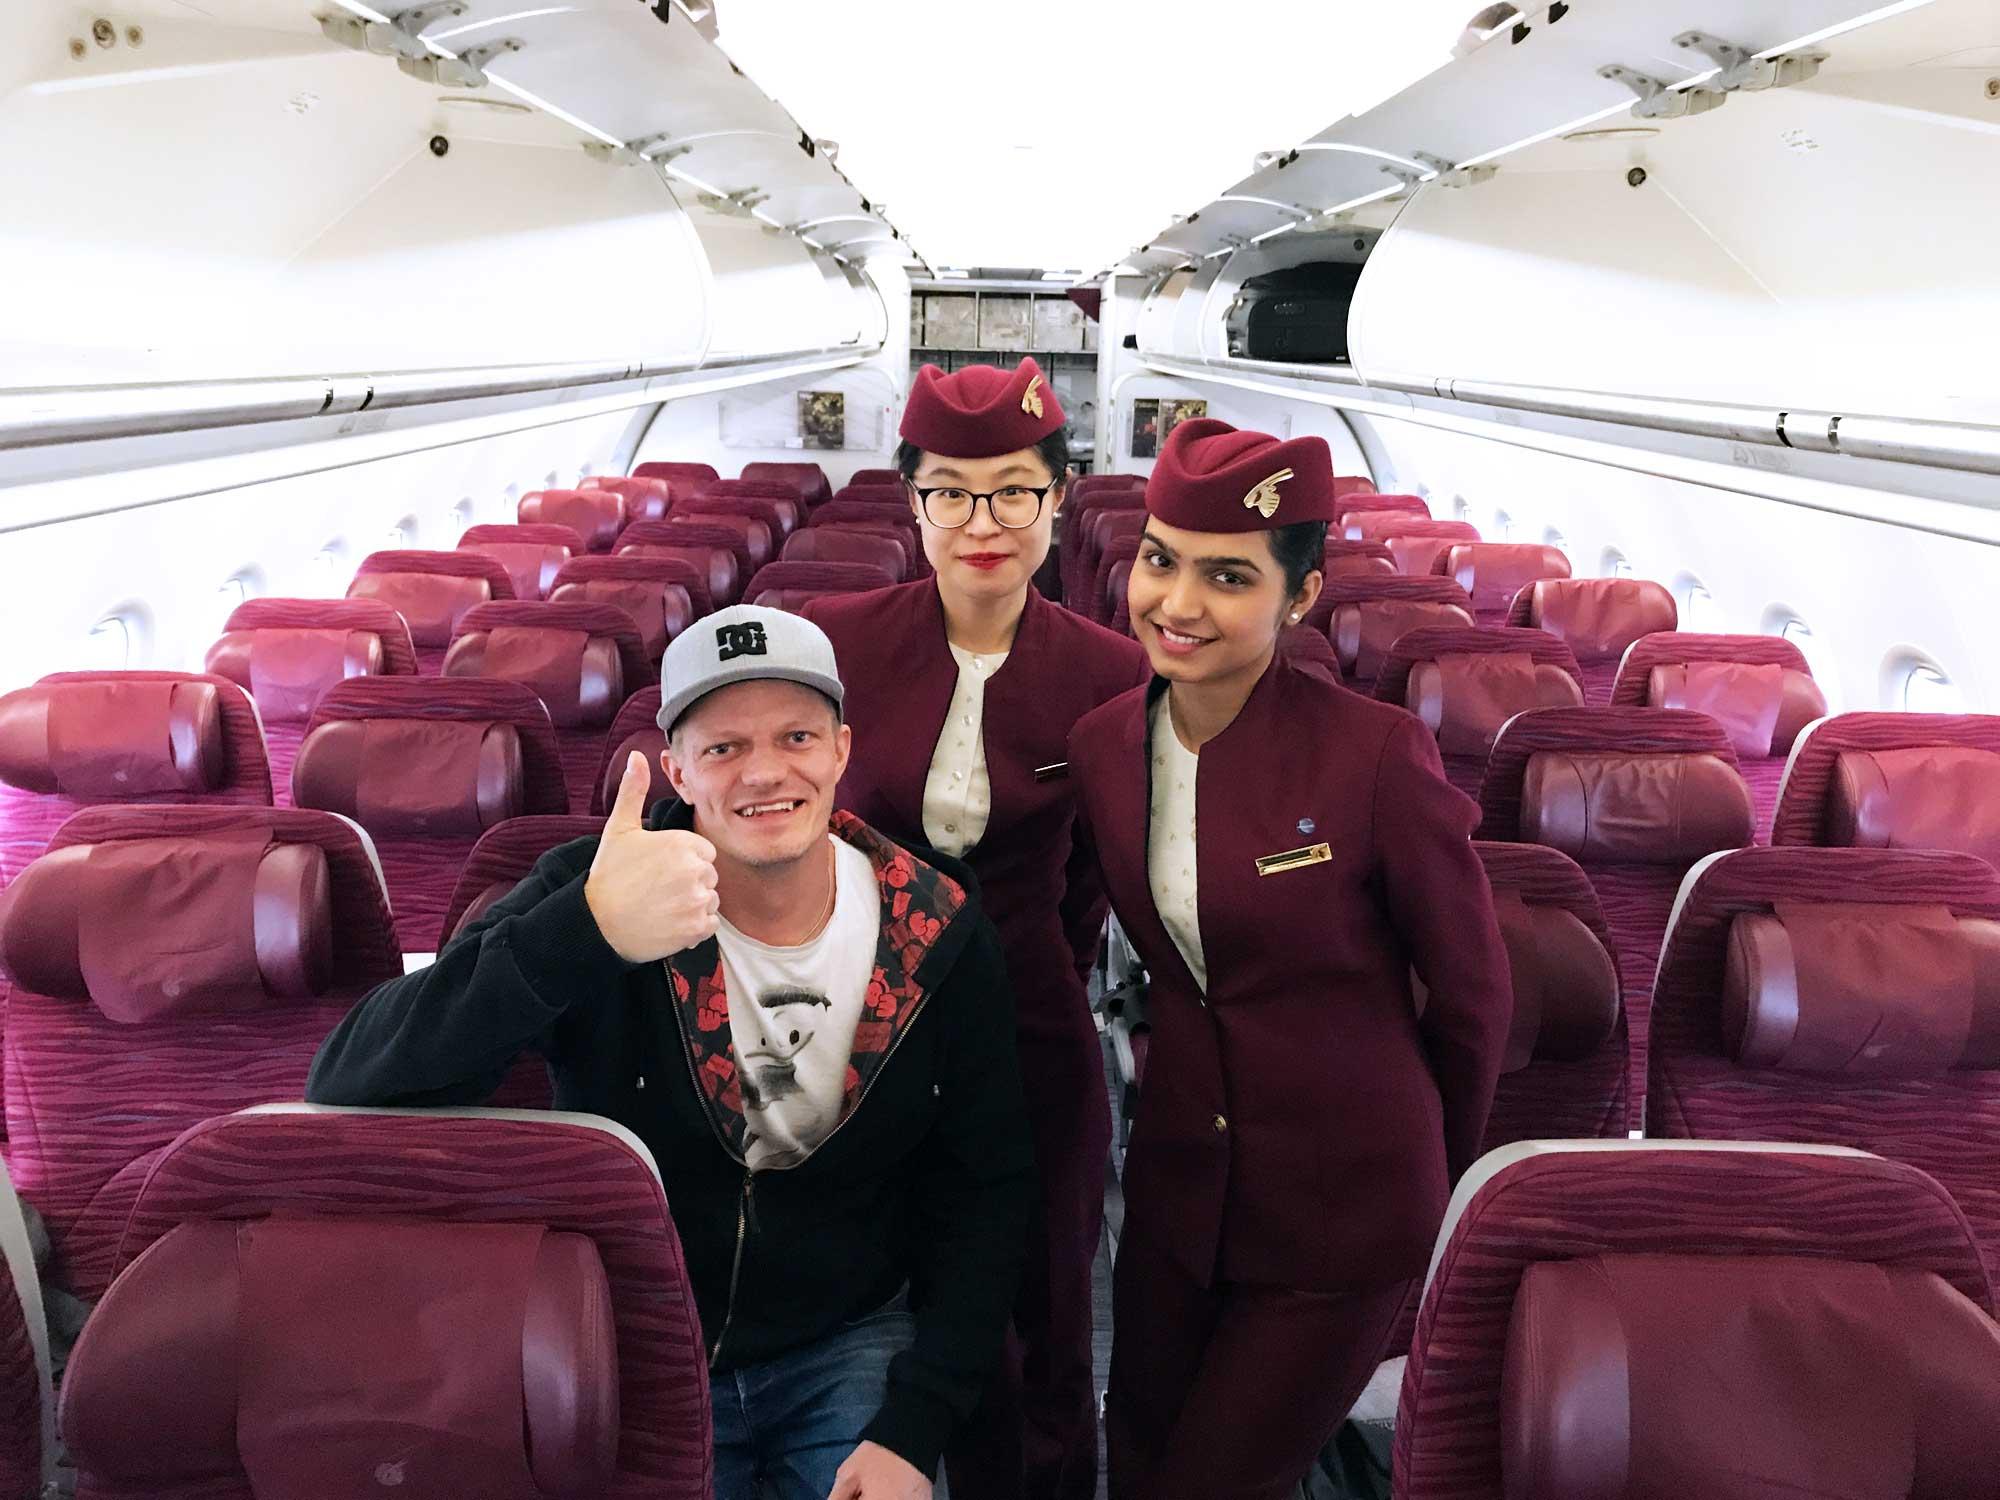 Qatar Airways QR308 - Cabin crew - Helsinki to Doha - Travel - Blog - Screw Them All